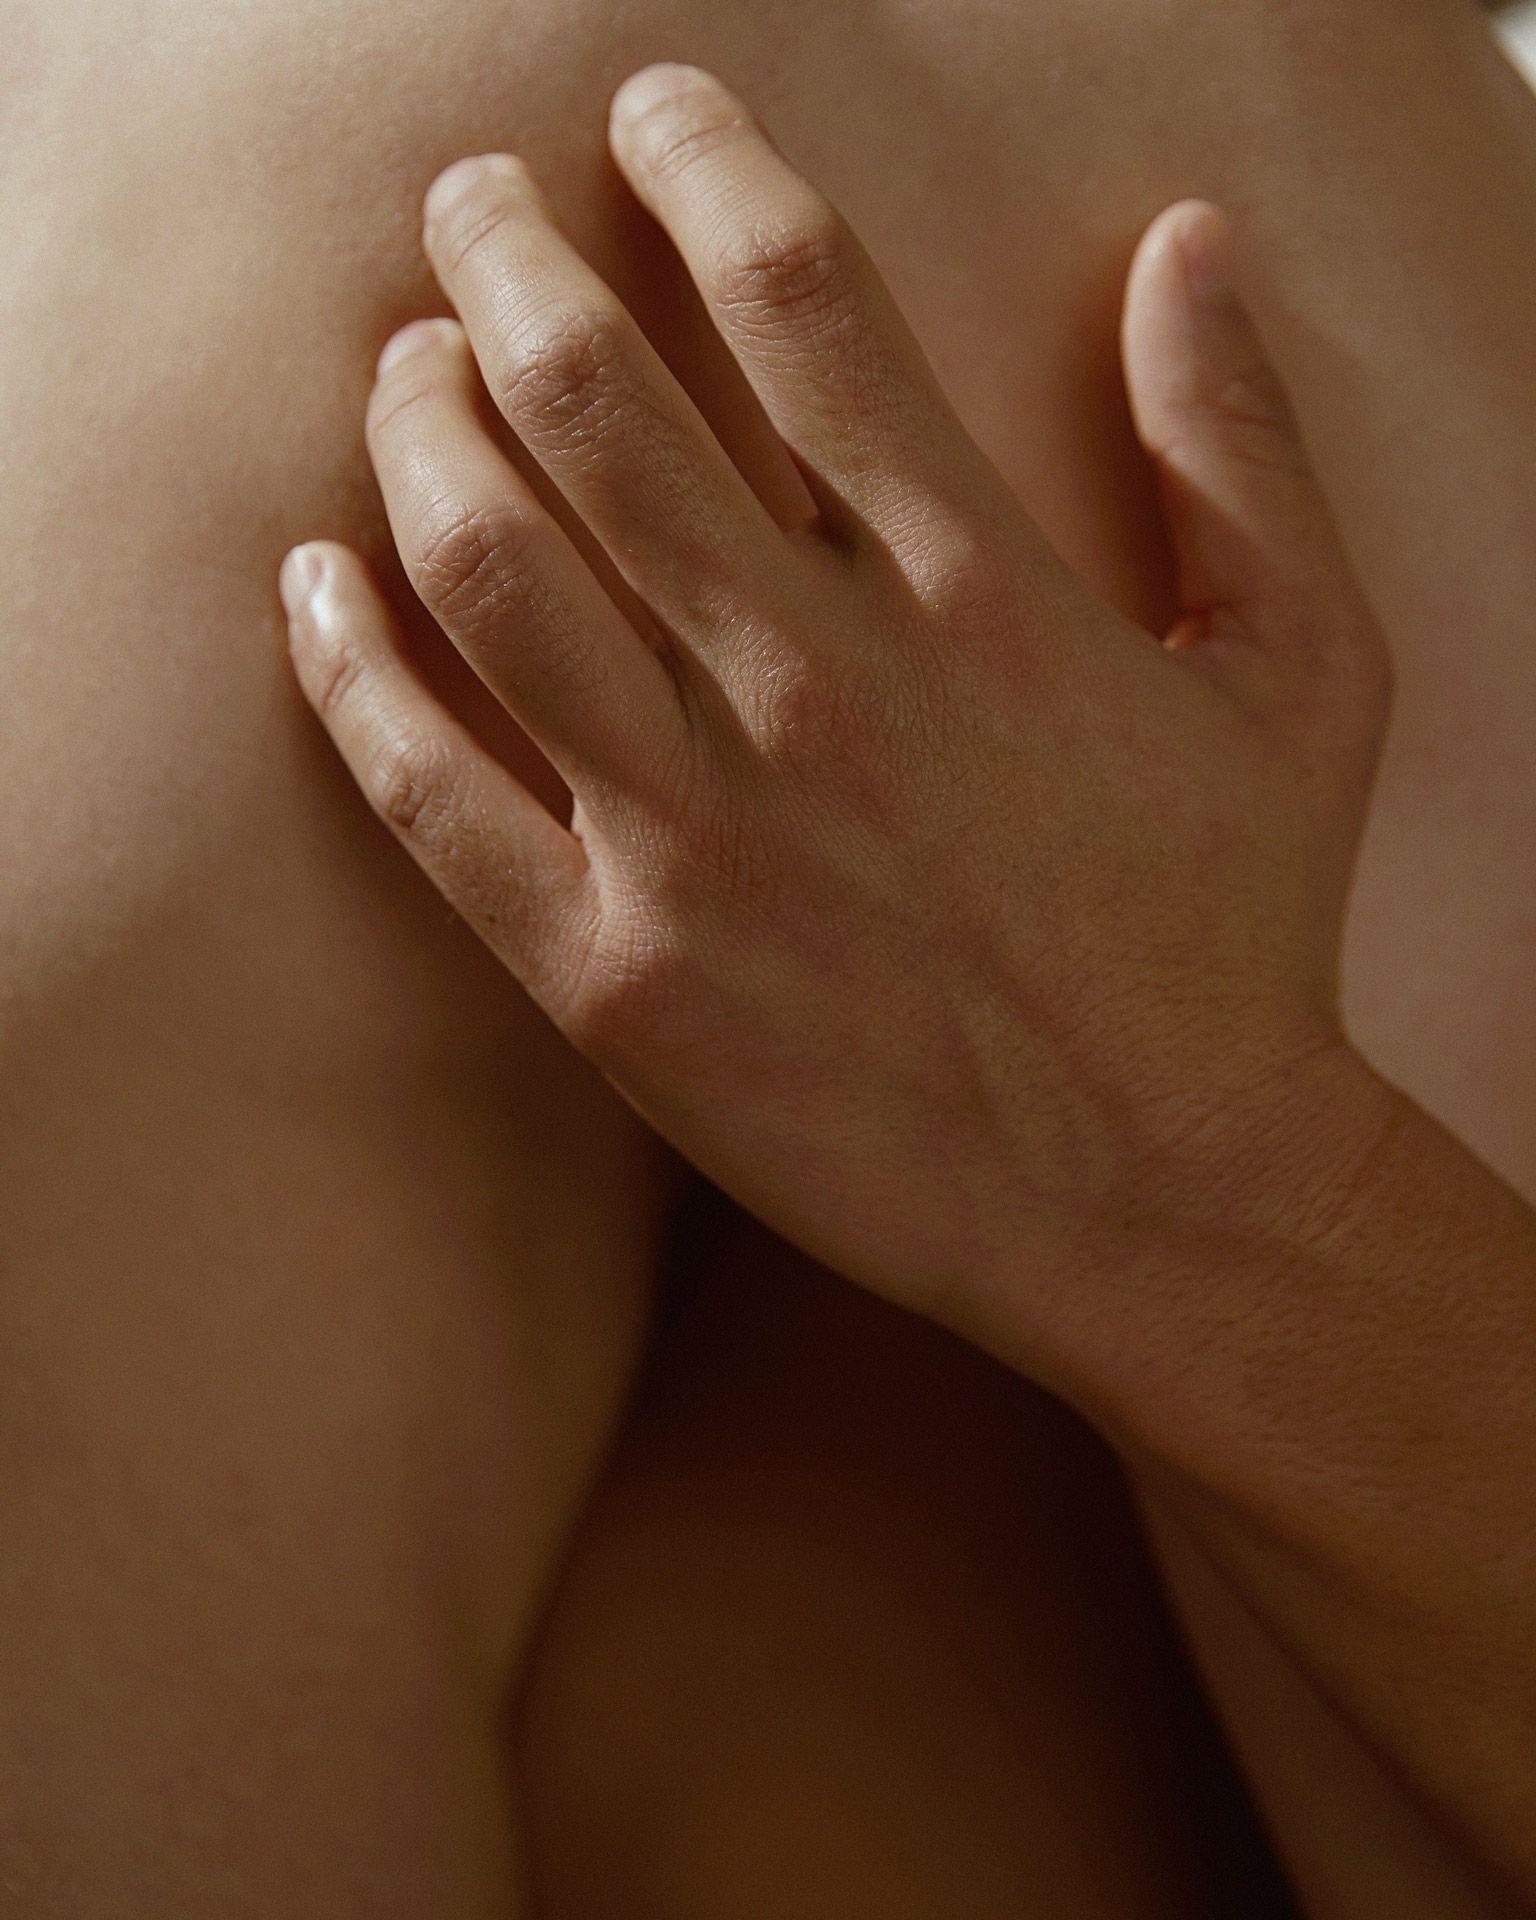 Close up shot of hand touching a naked torso.